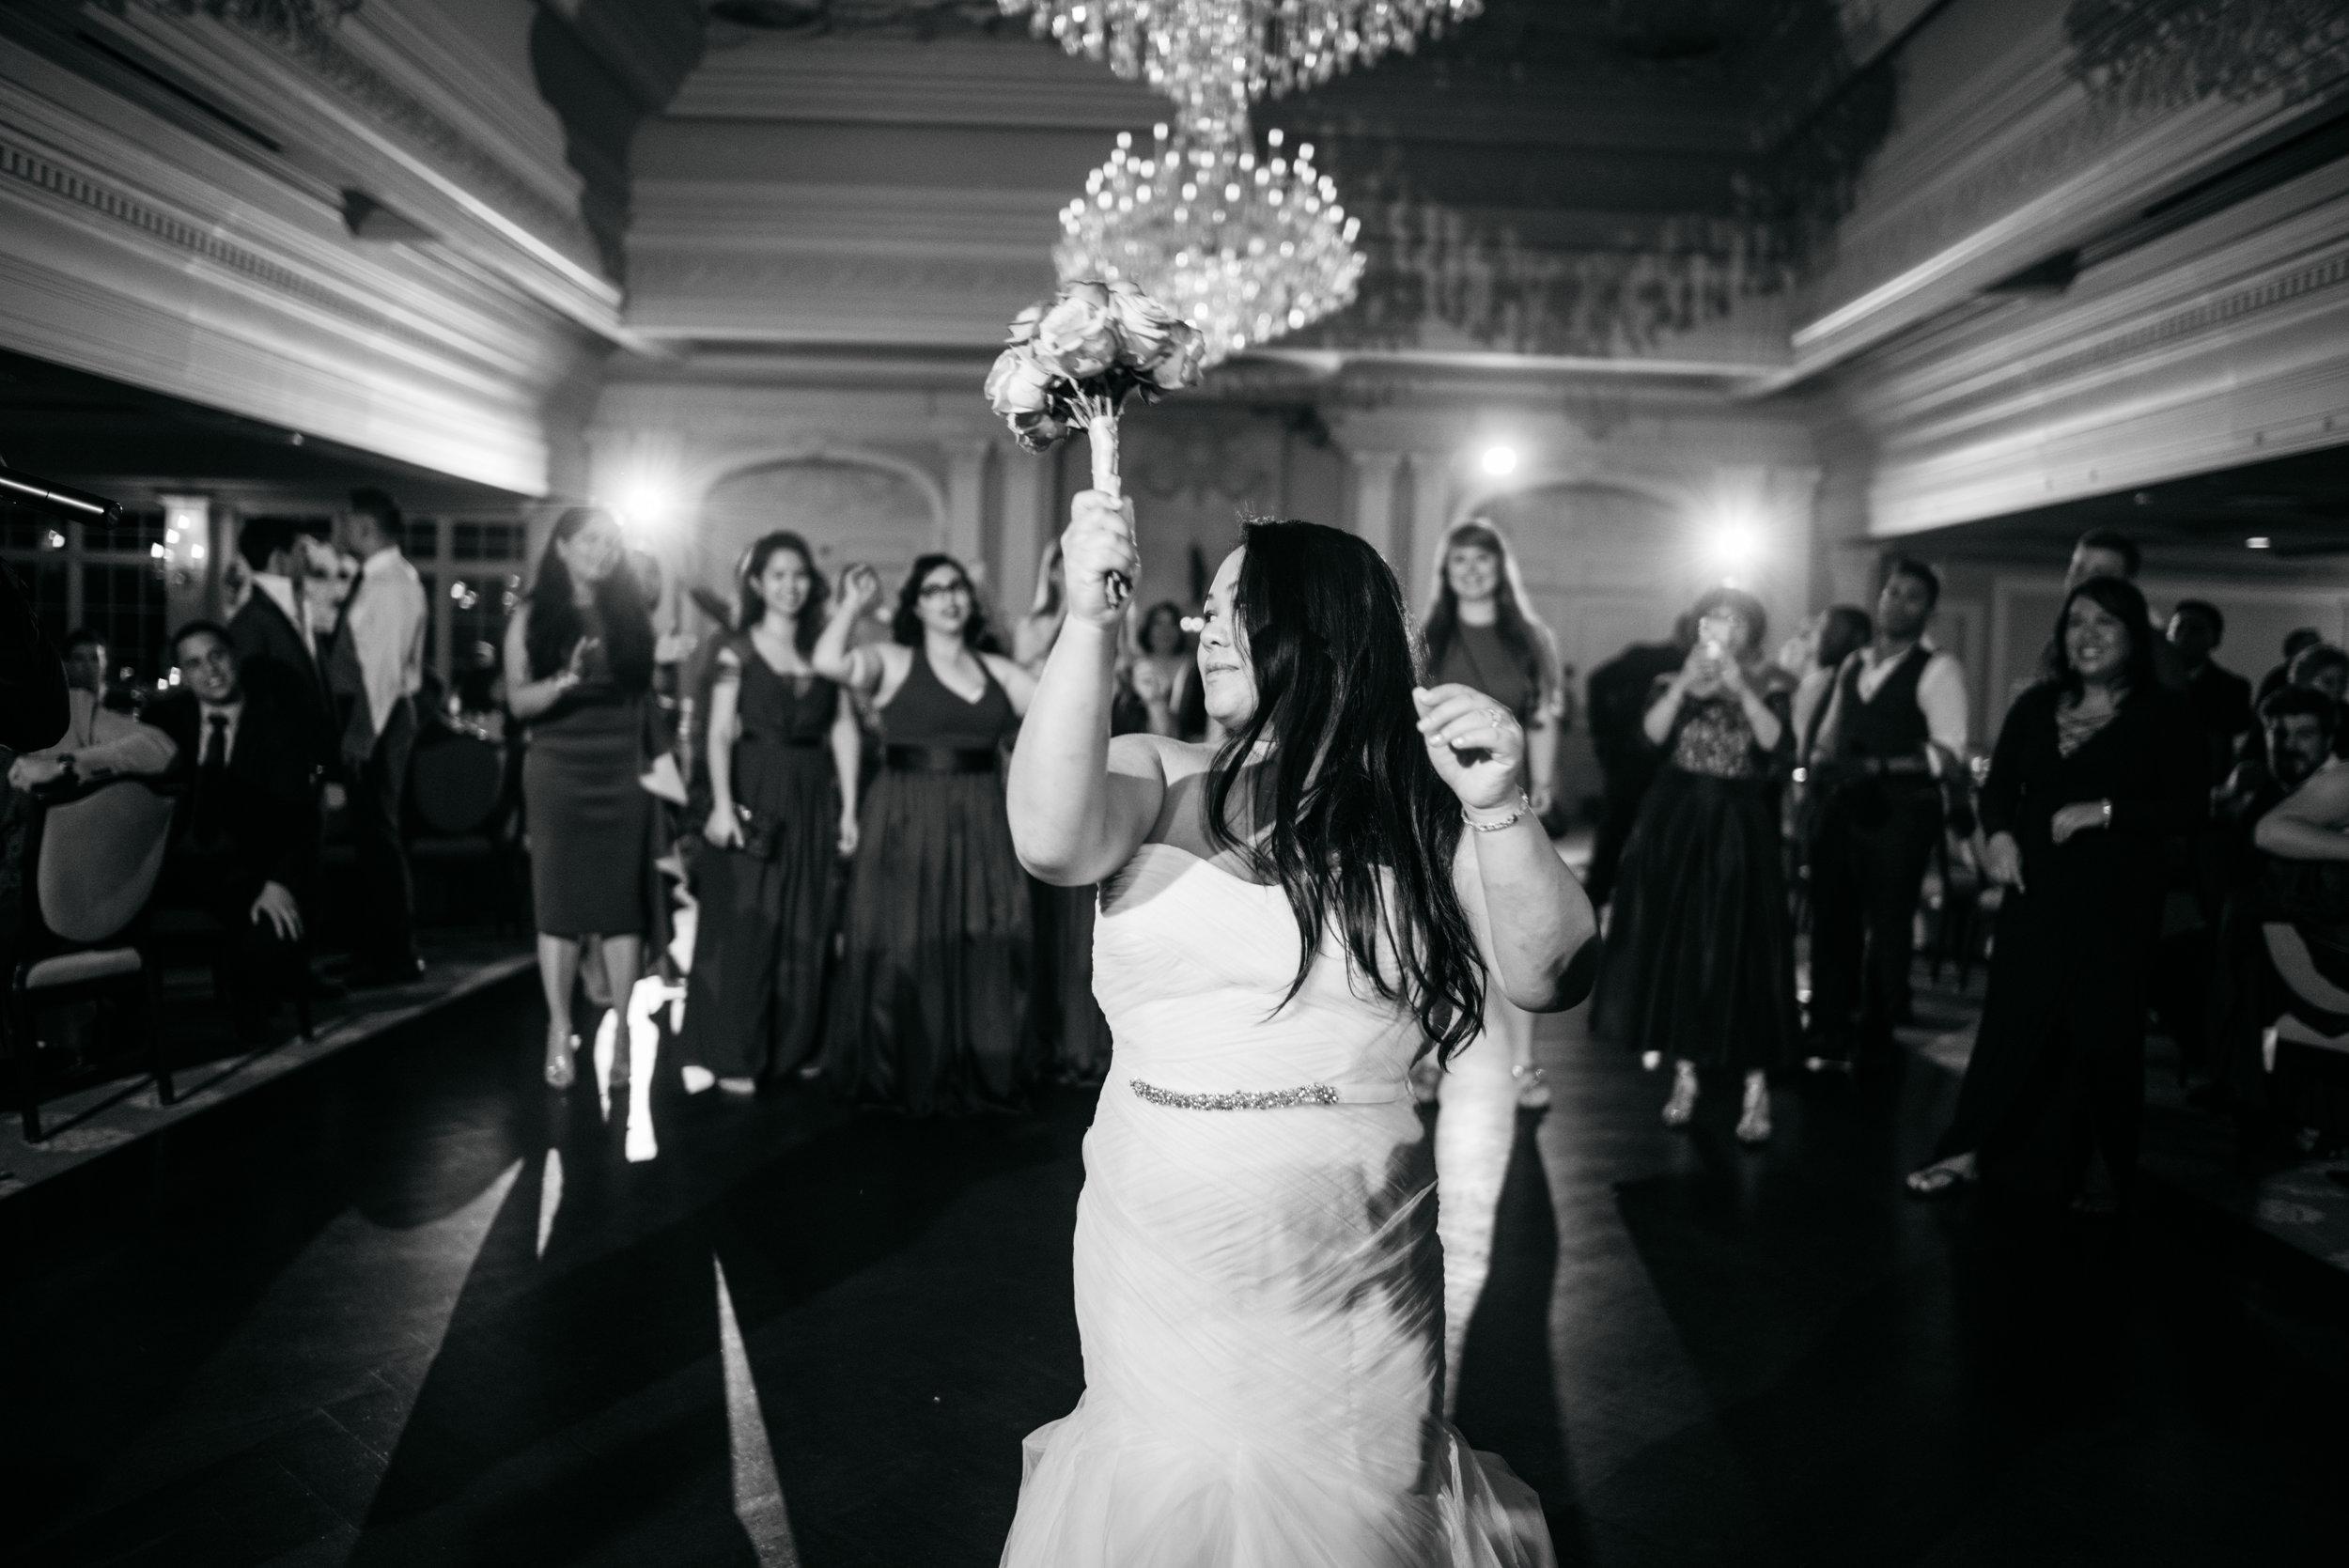 WeddingPhotos | NJPhotographer | Highlights-12-4.jpg